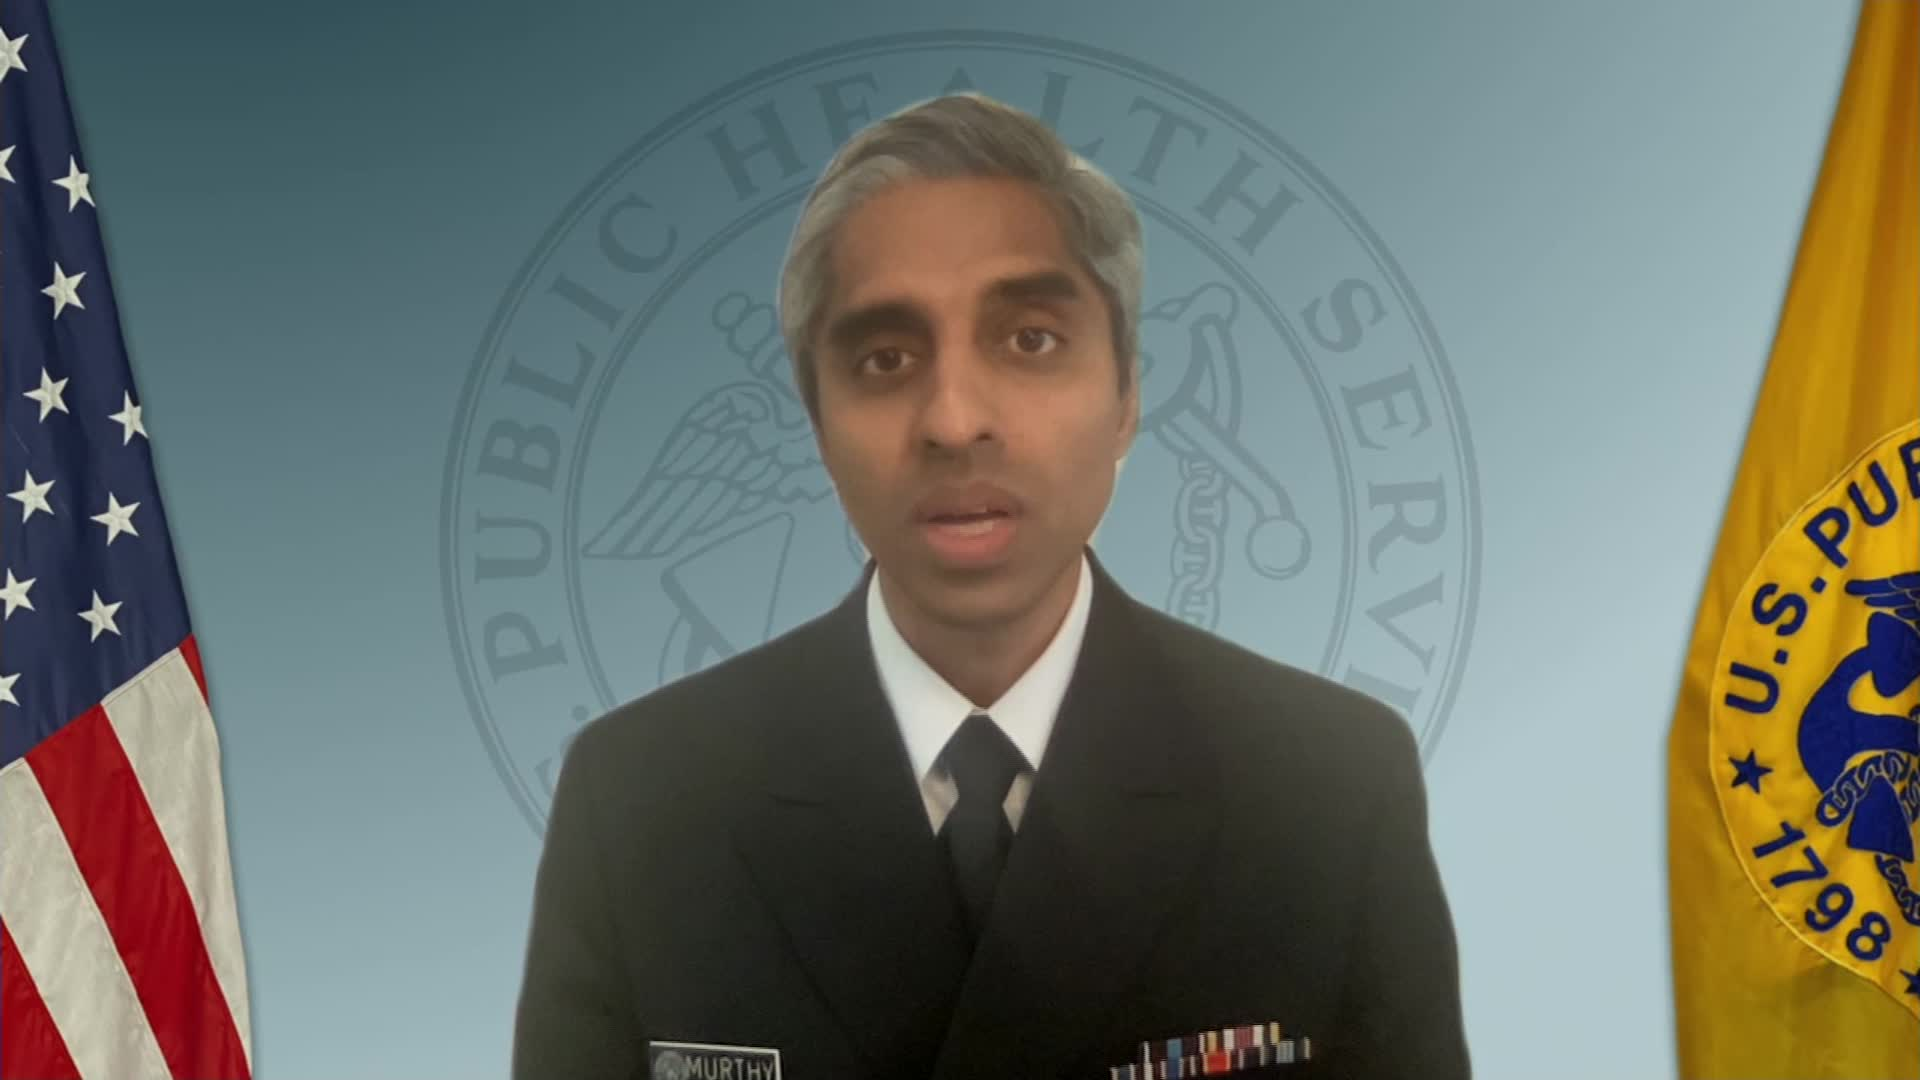 US Surgeon General Dr. Vivek Murthy.